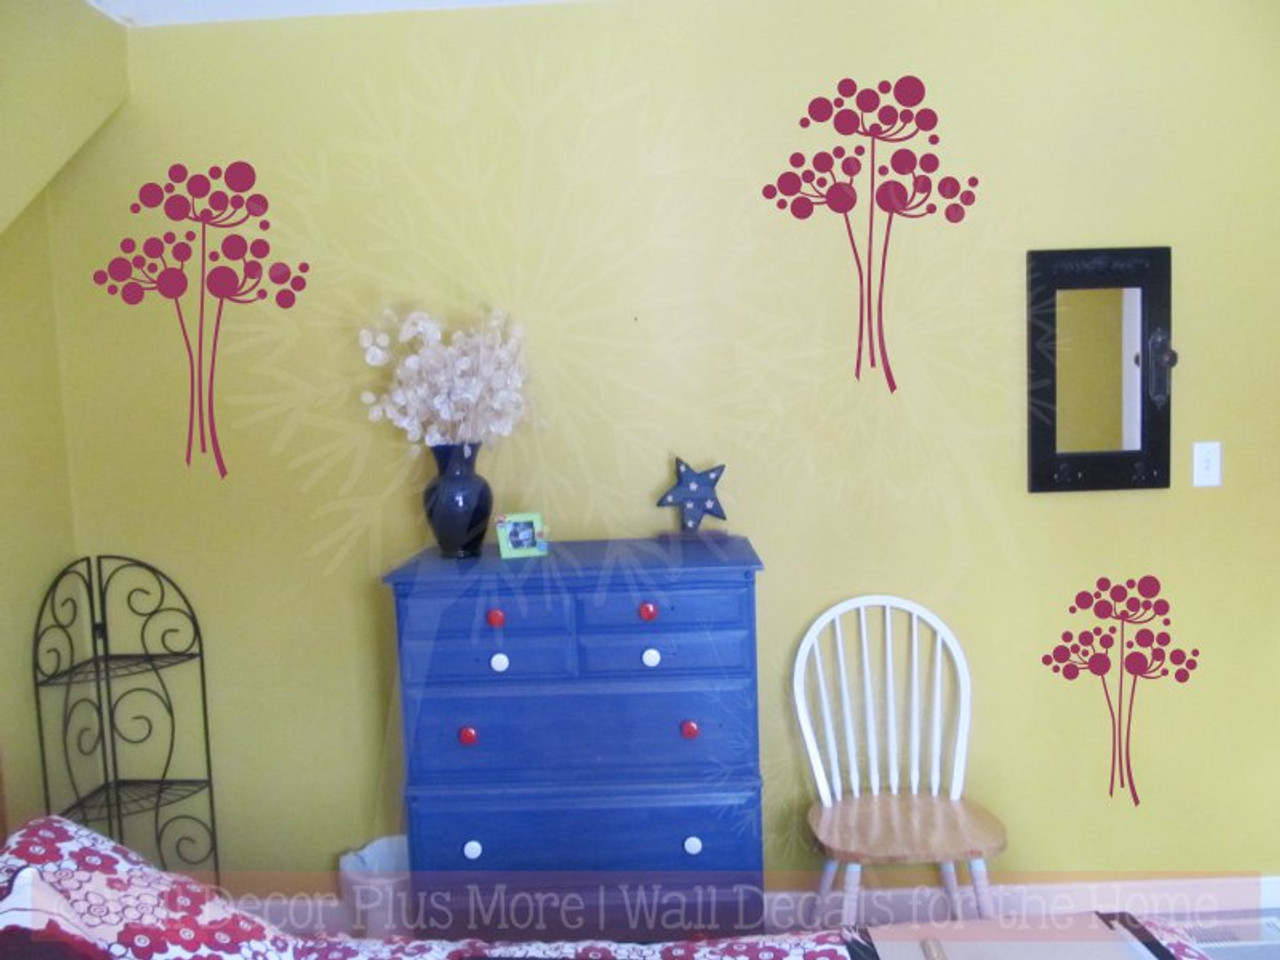 flower wall decals vinyl art home wall décor stickers set of 3 flowers